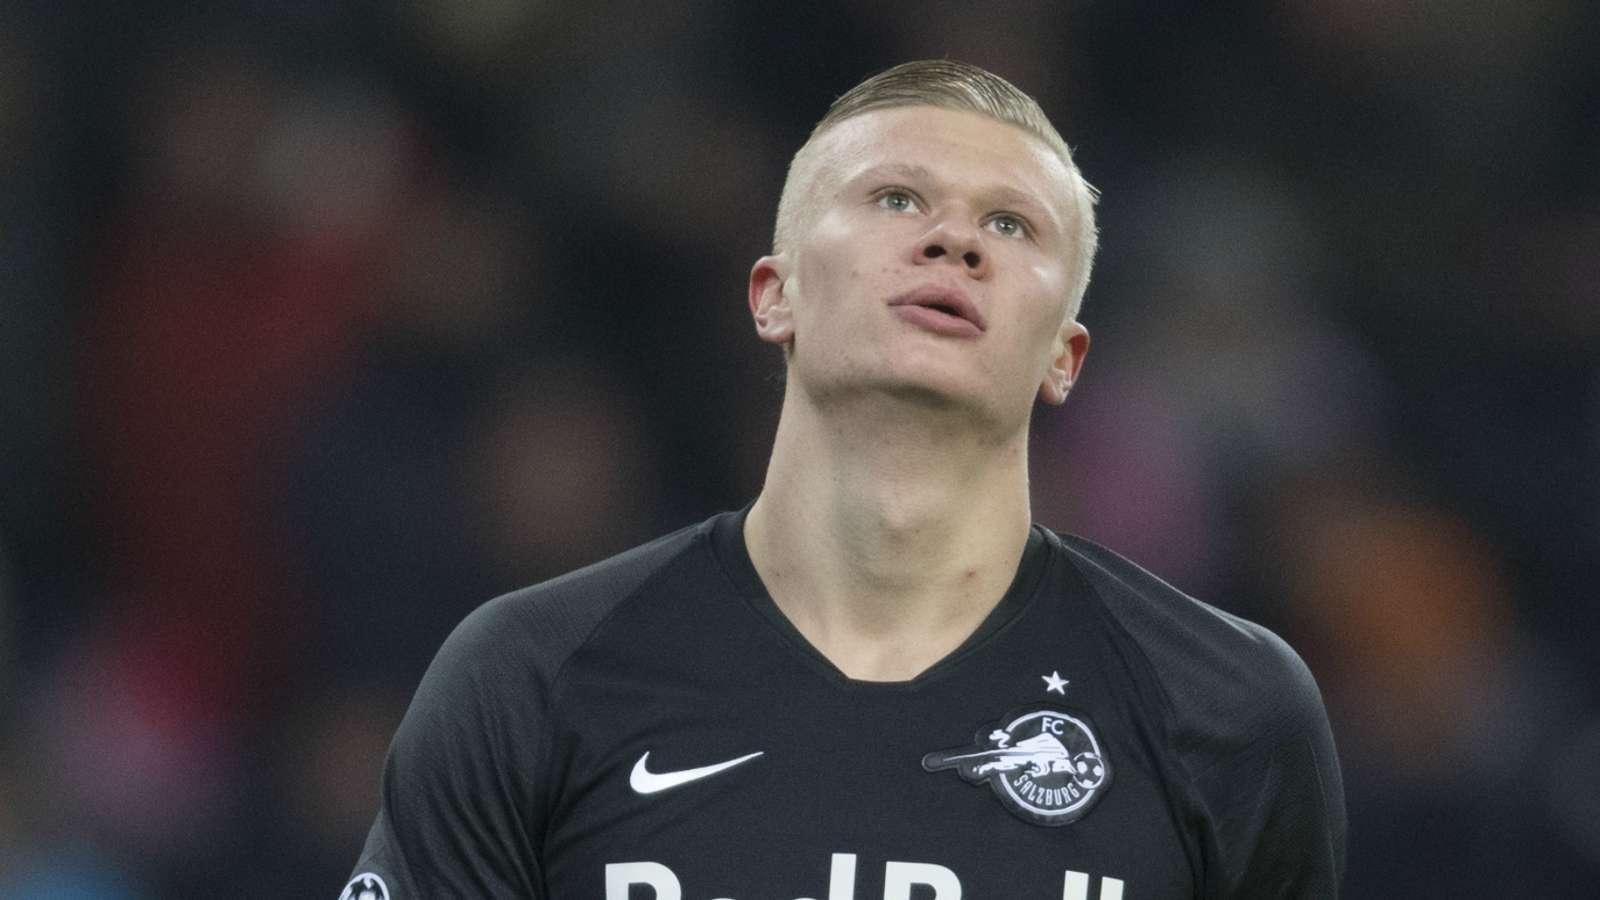 Man Utd don't need Haaland – berbatov